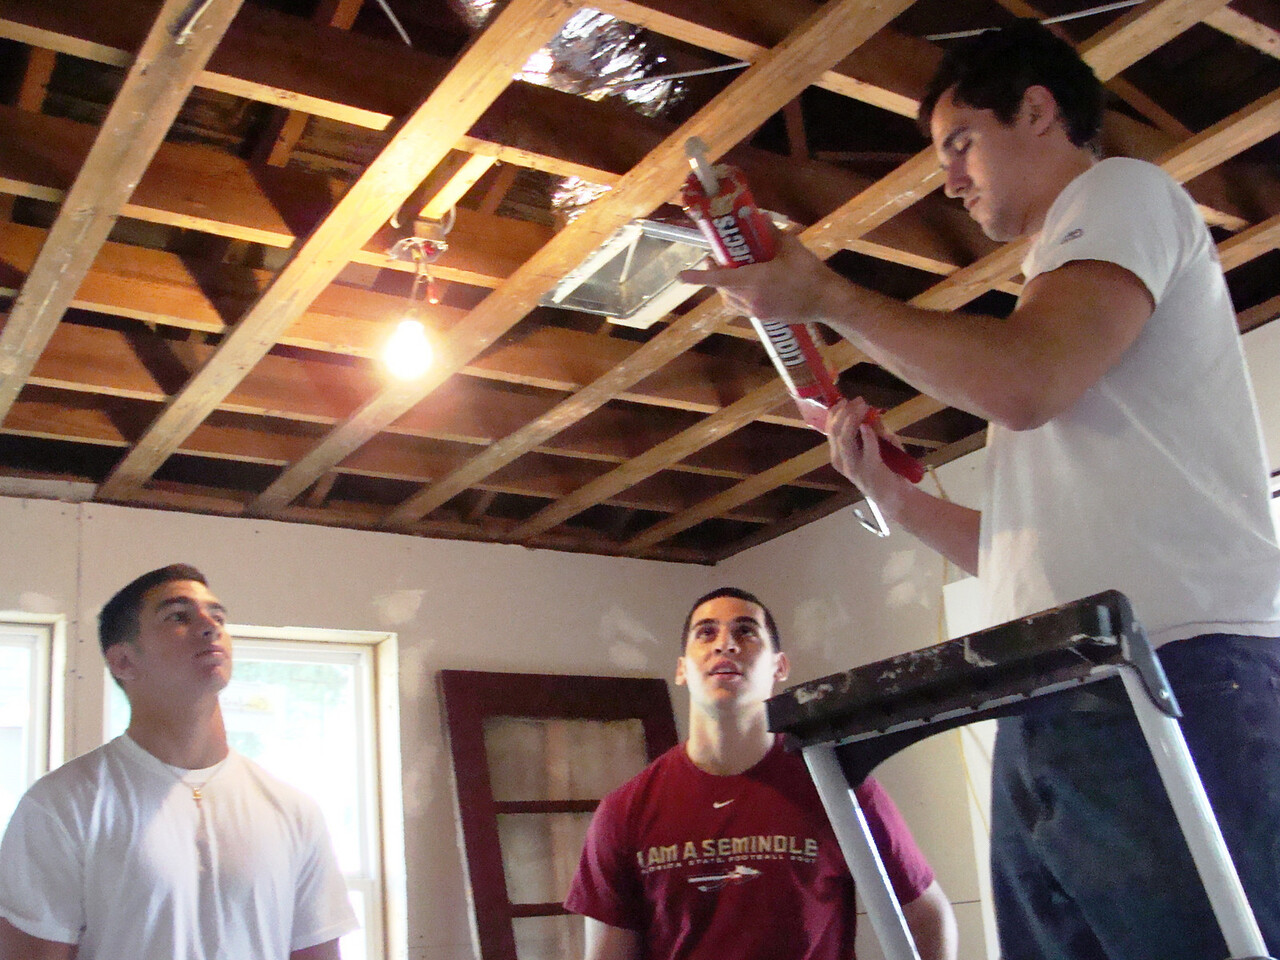 08 11/08 - FSU student applying glue prior to putting up dry wall. kl-b